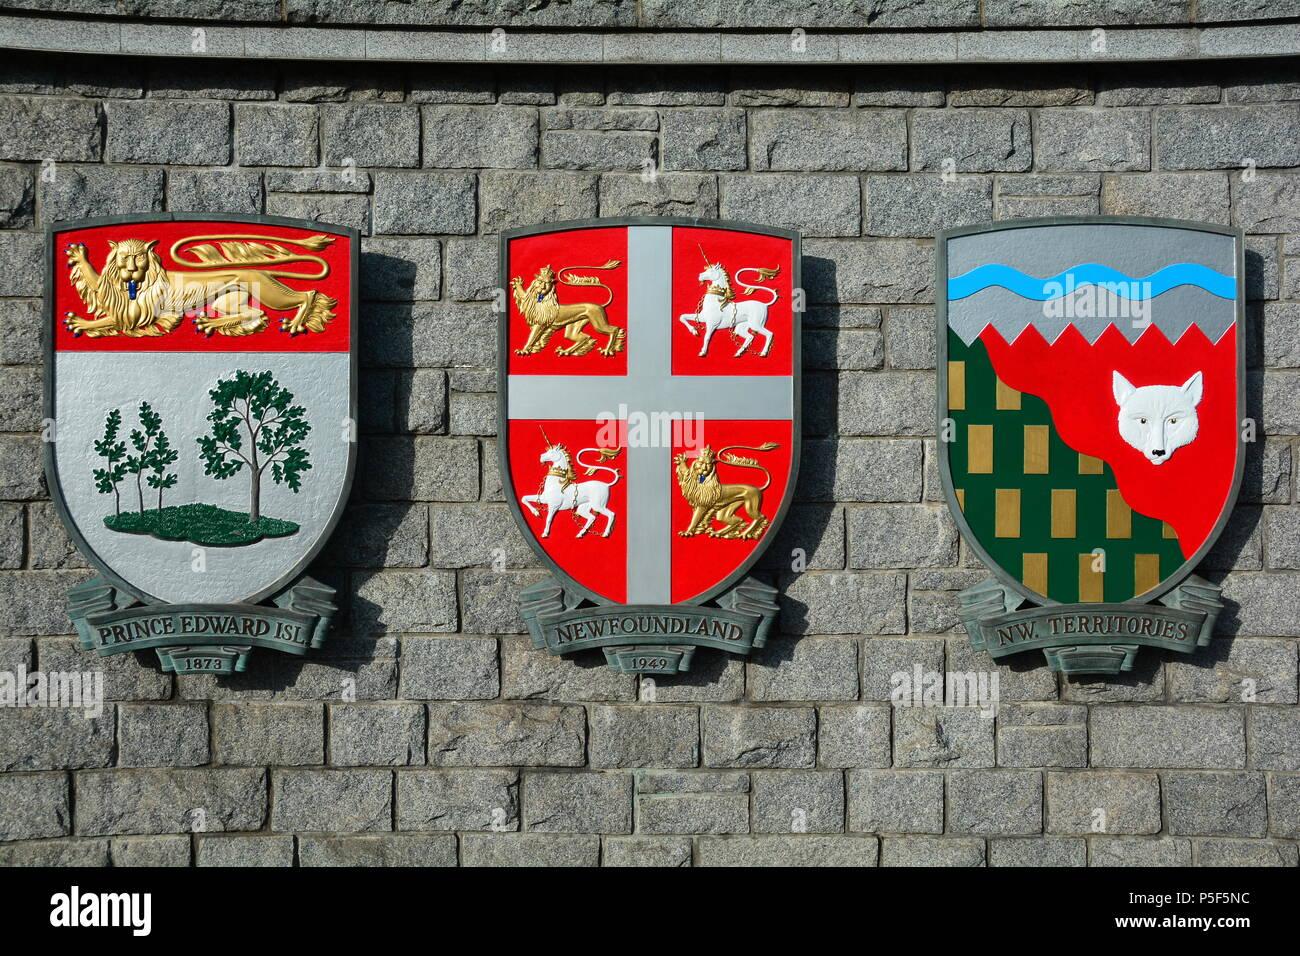 Canadian Symbols Stock Photos & Canadian Symbols Stock